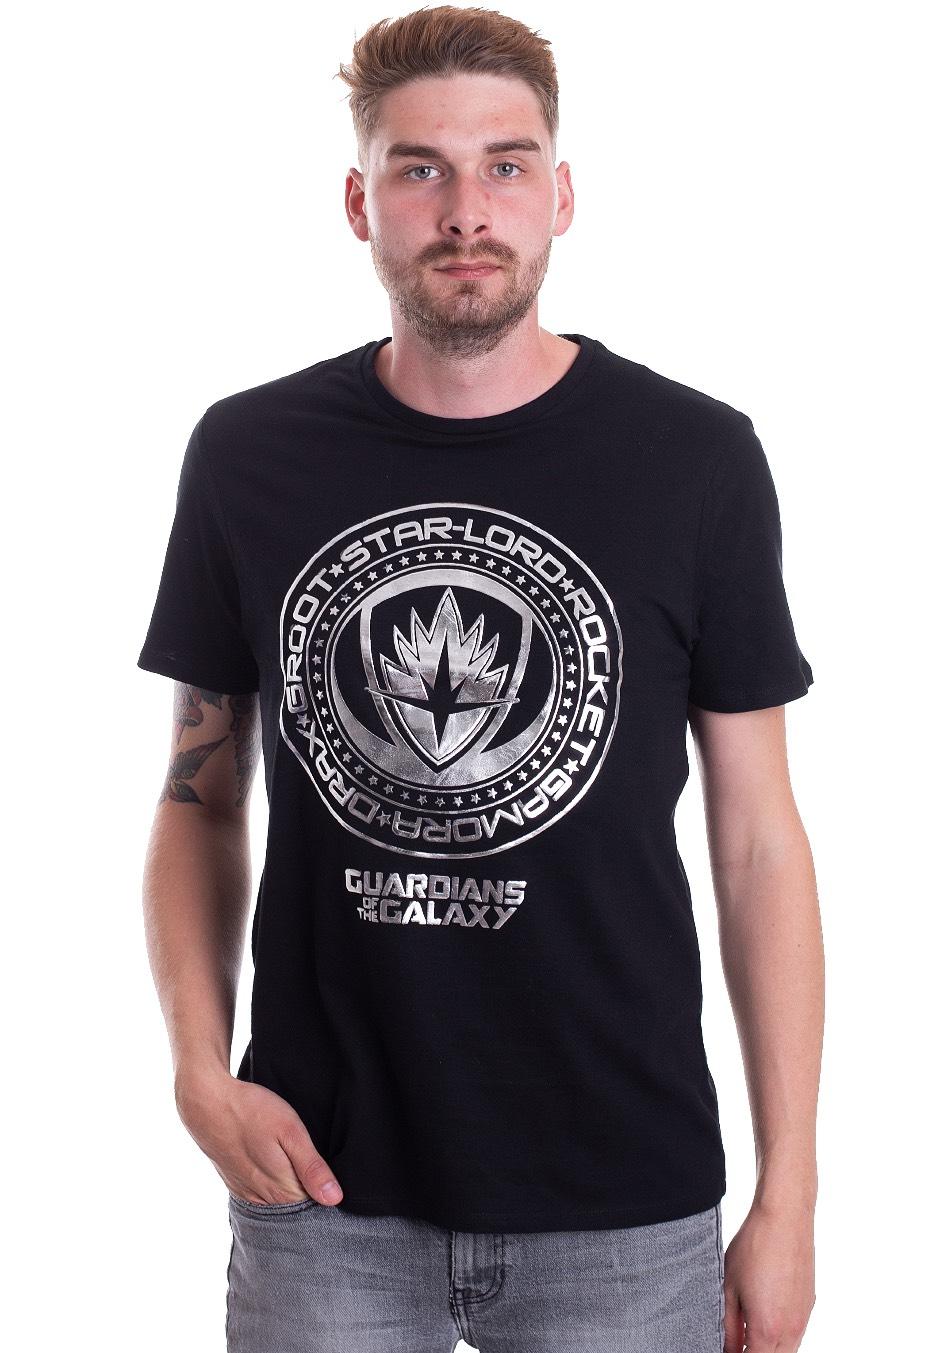 Guardians Of The Galaxy - Guardians Emblem - - T-Shirts